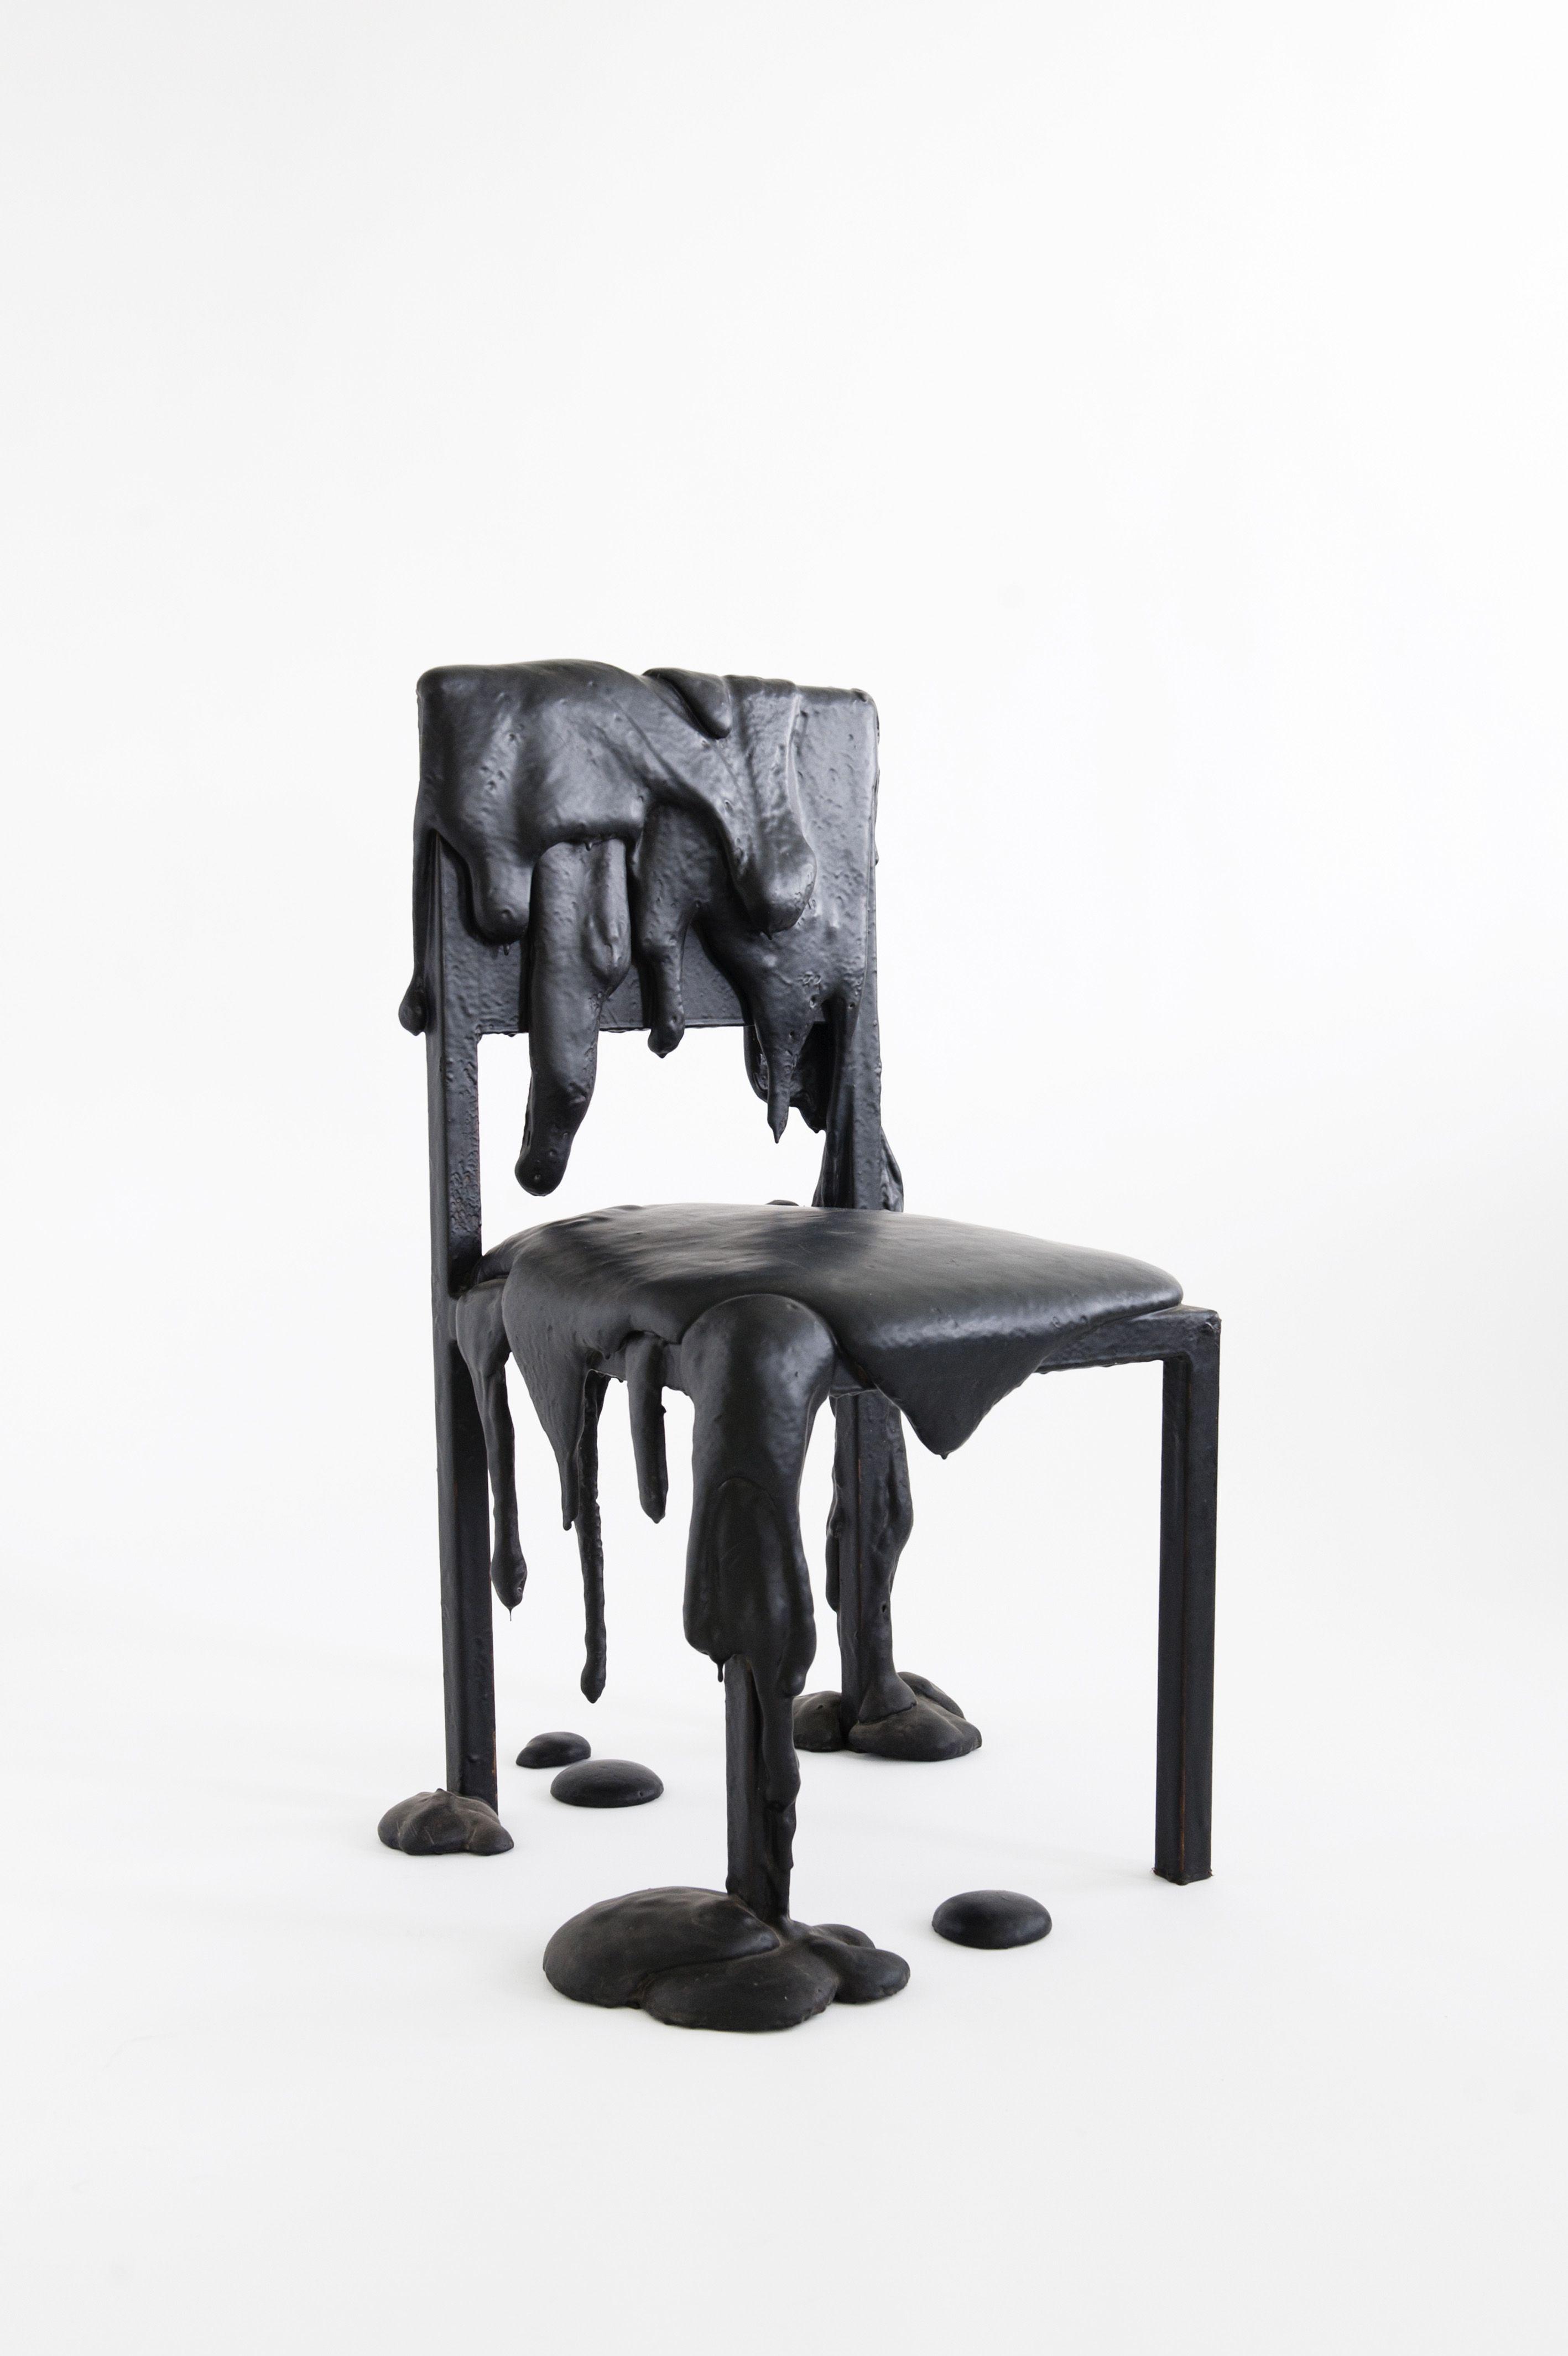 Stuhl . Chaise | Design: Pepe Heykoop |